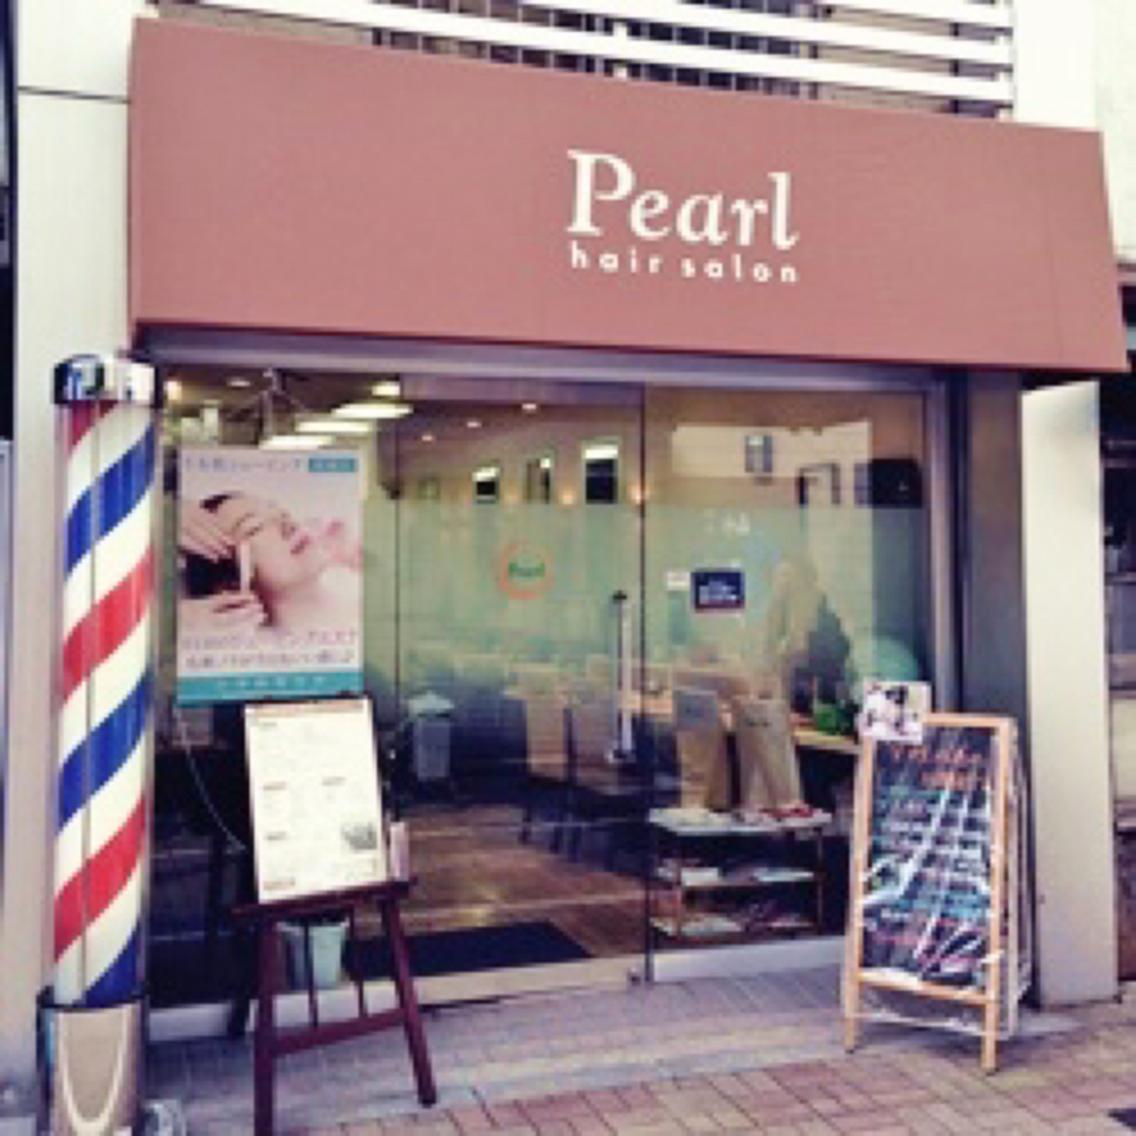 Hair Salon Pearl メンズパーマモデル、レディースカットモデル募集!